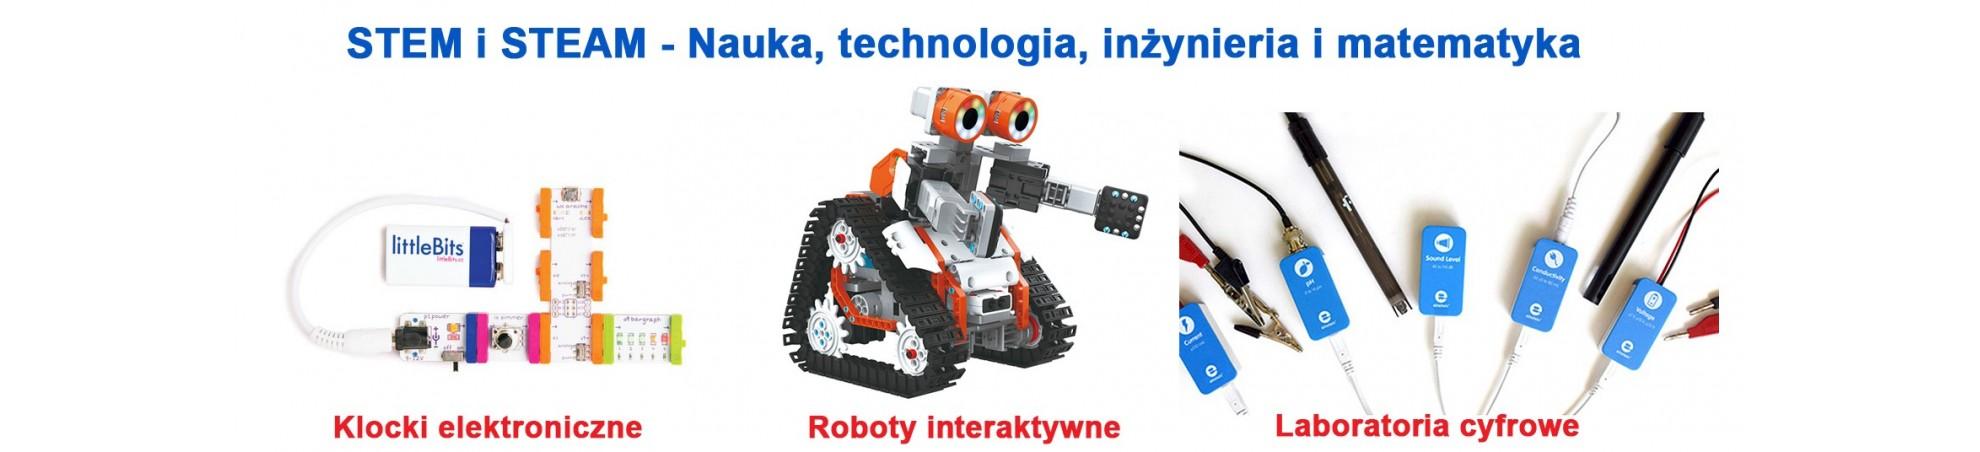 STEM i STEAM - roboty, laboratoria cyfrowe